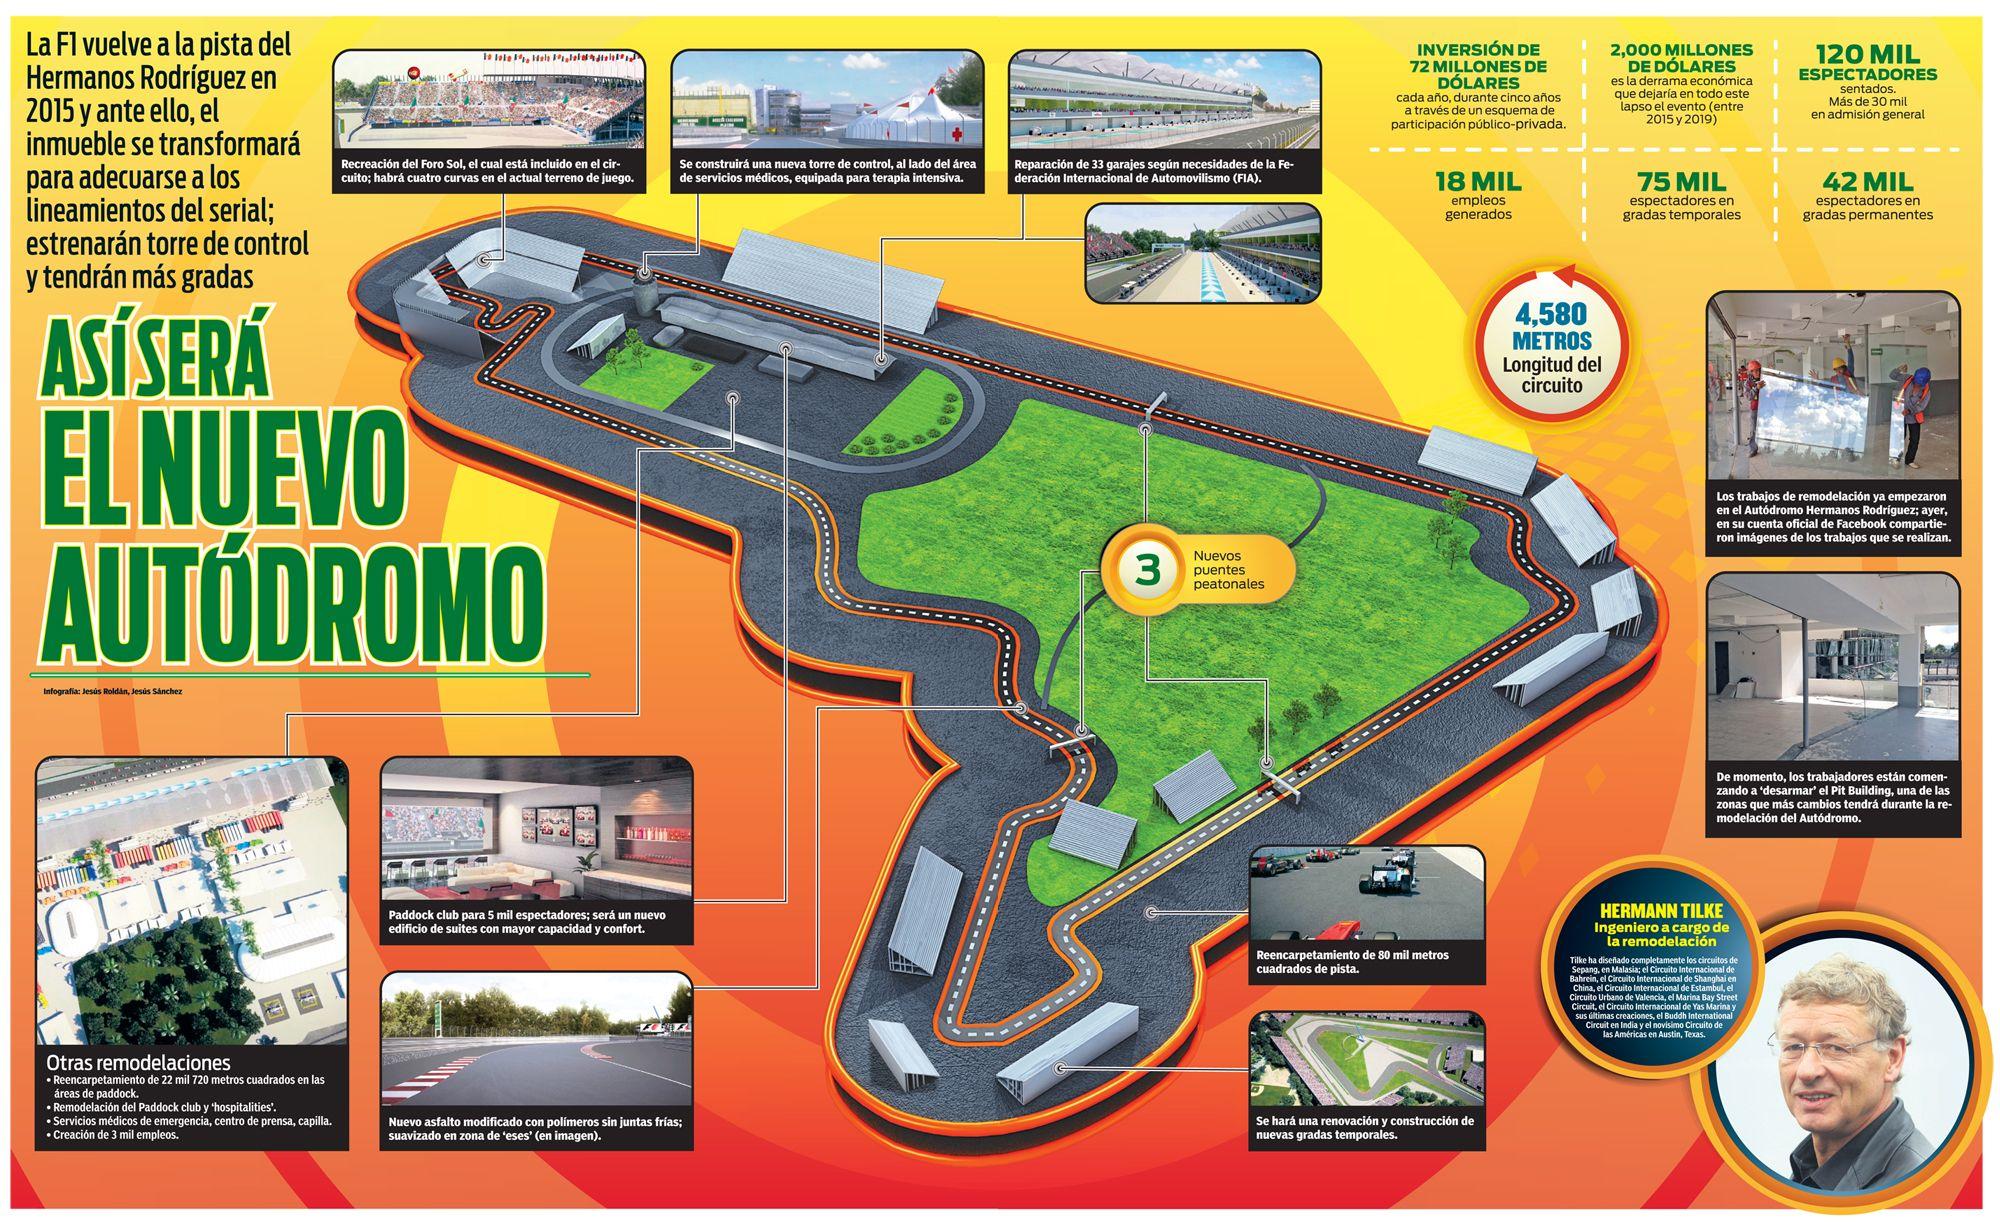 Cdmx aut dromo hermanos rodr guez remodelaci n page for Puerta 5 autodromo hermanos rodriguez